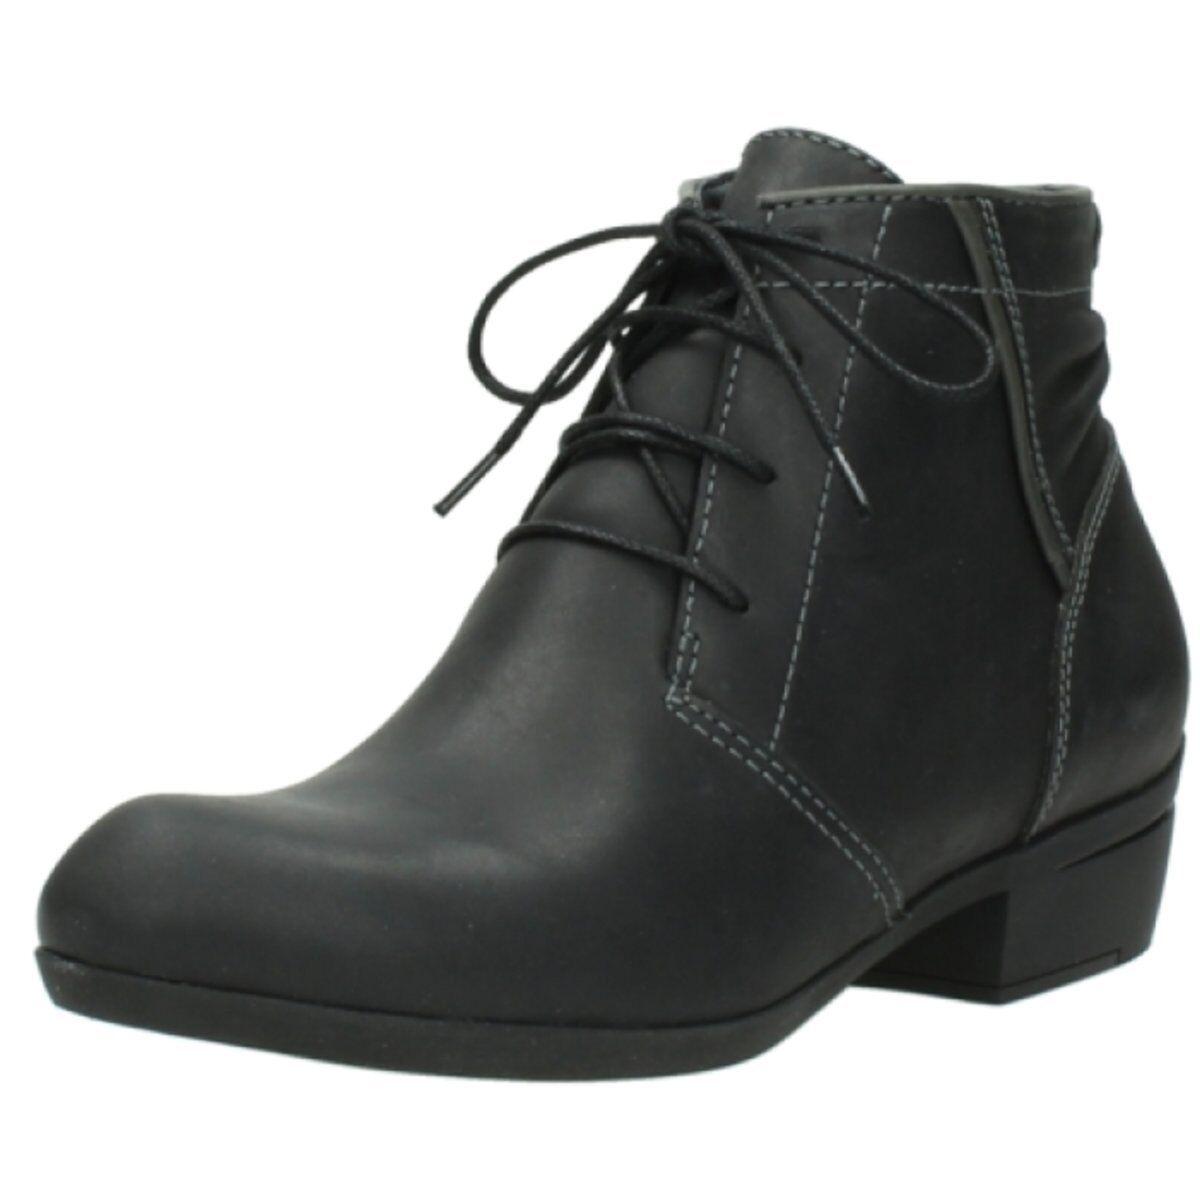 NEU Wolky Damen Stiefeletten El Dorado Algarve leather Blac 0095150002 grau